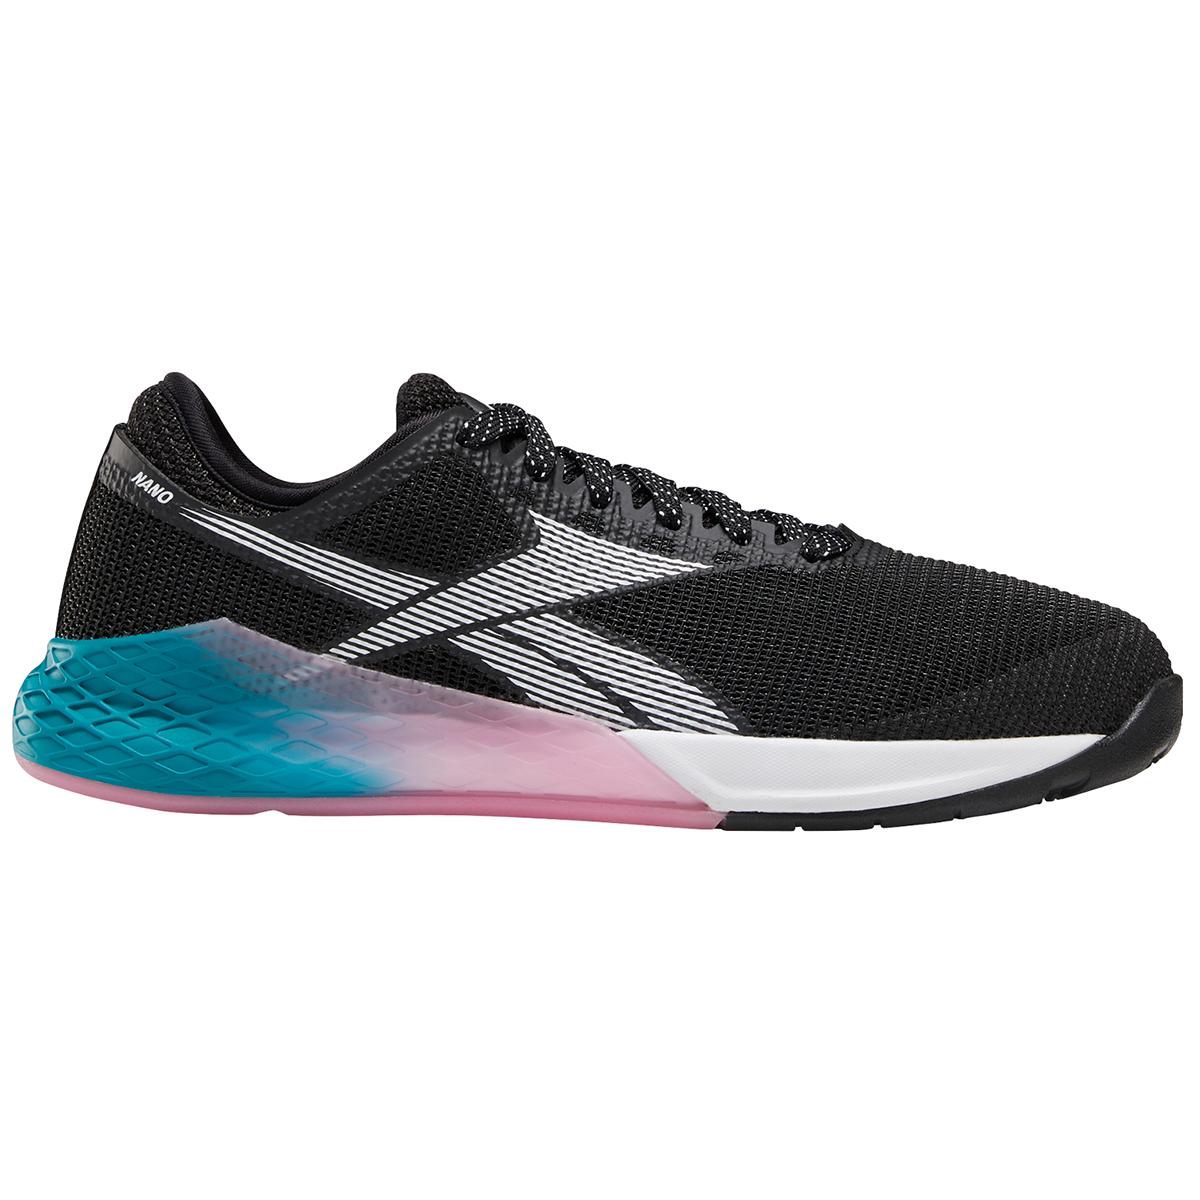 Reebok Women's Nano 9 Training Shoes - Black, 8